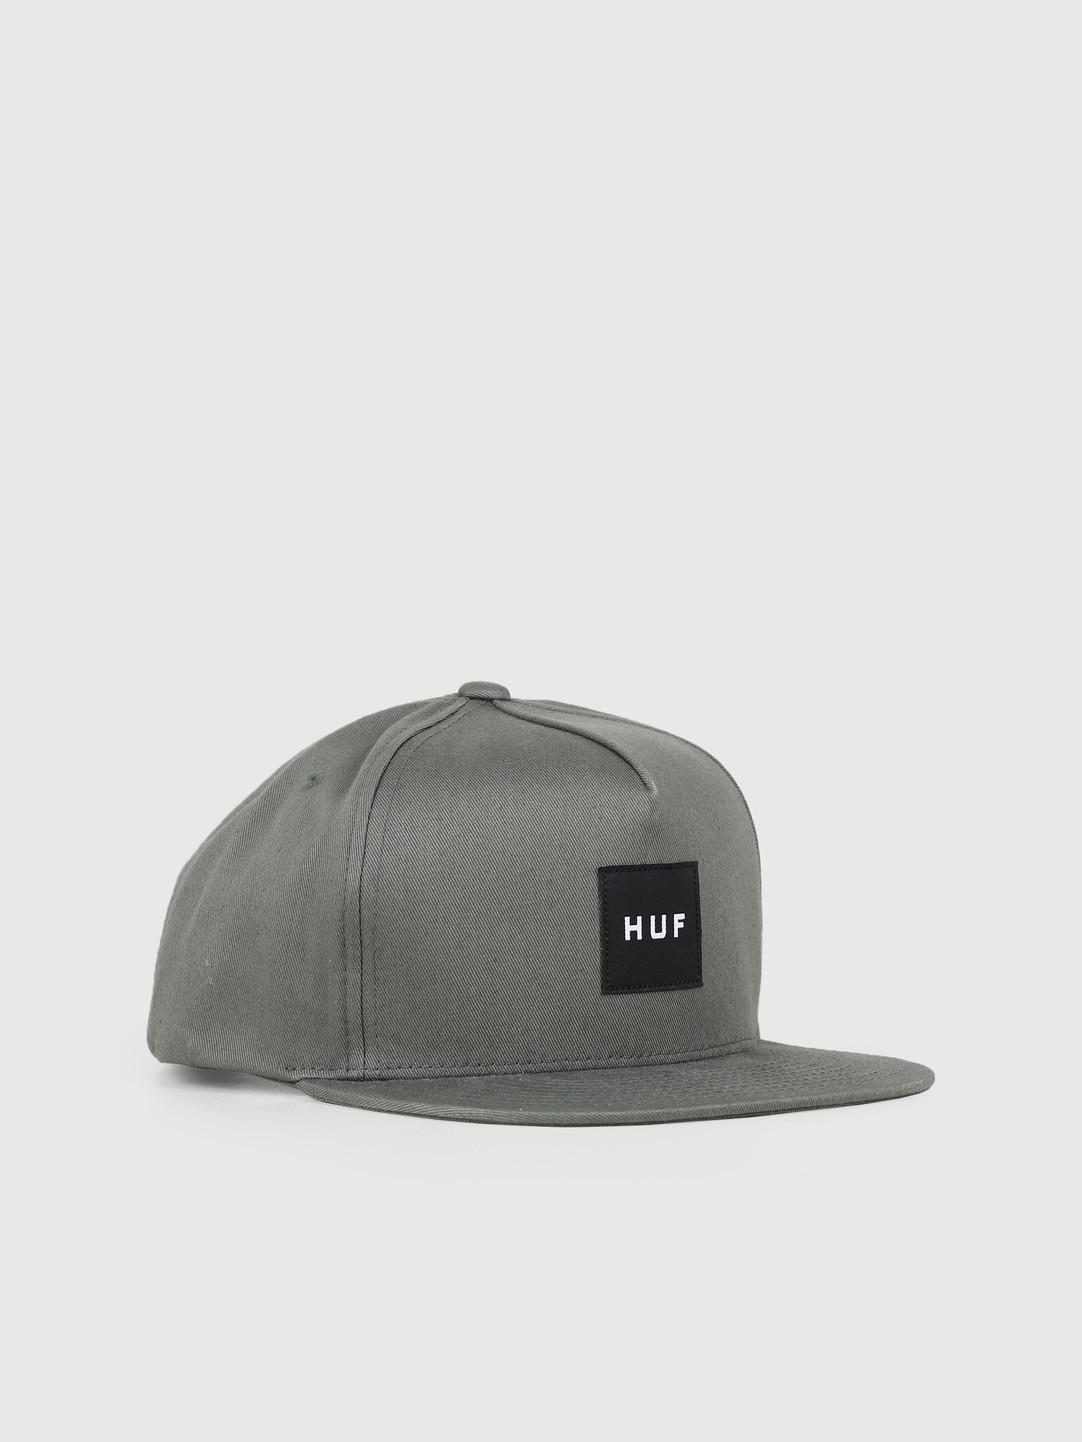 HUF HUF Essentials Box Snapback Hat Army HT00343-Army